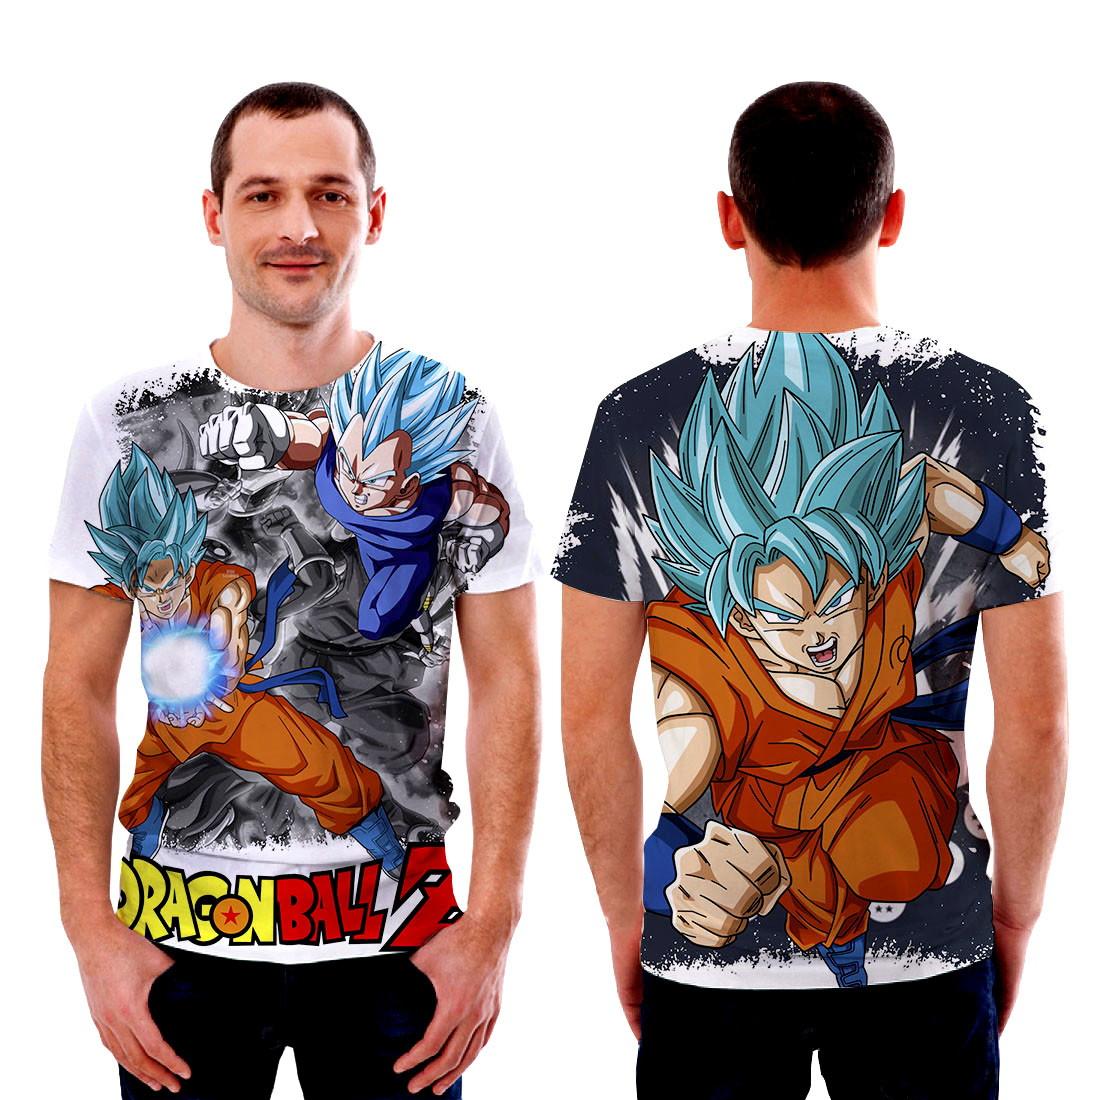 3e76febdd Camisetas Camisa Goku Dragon ball Z no Elo7